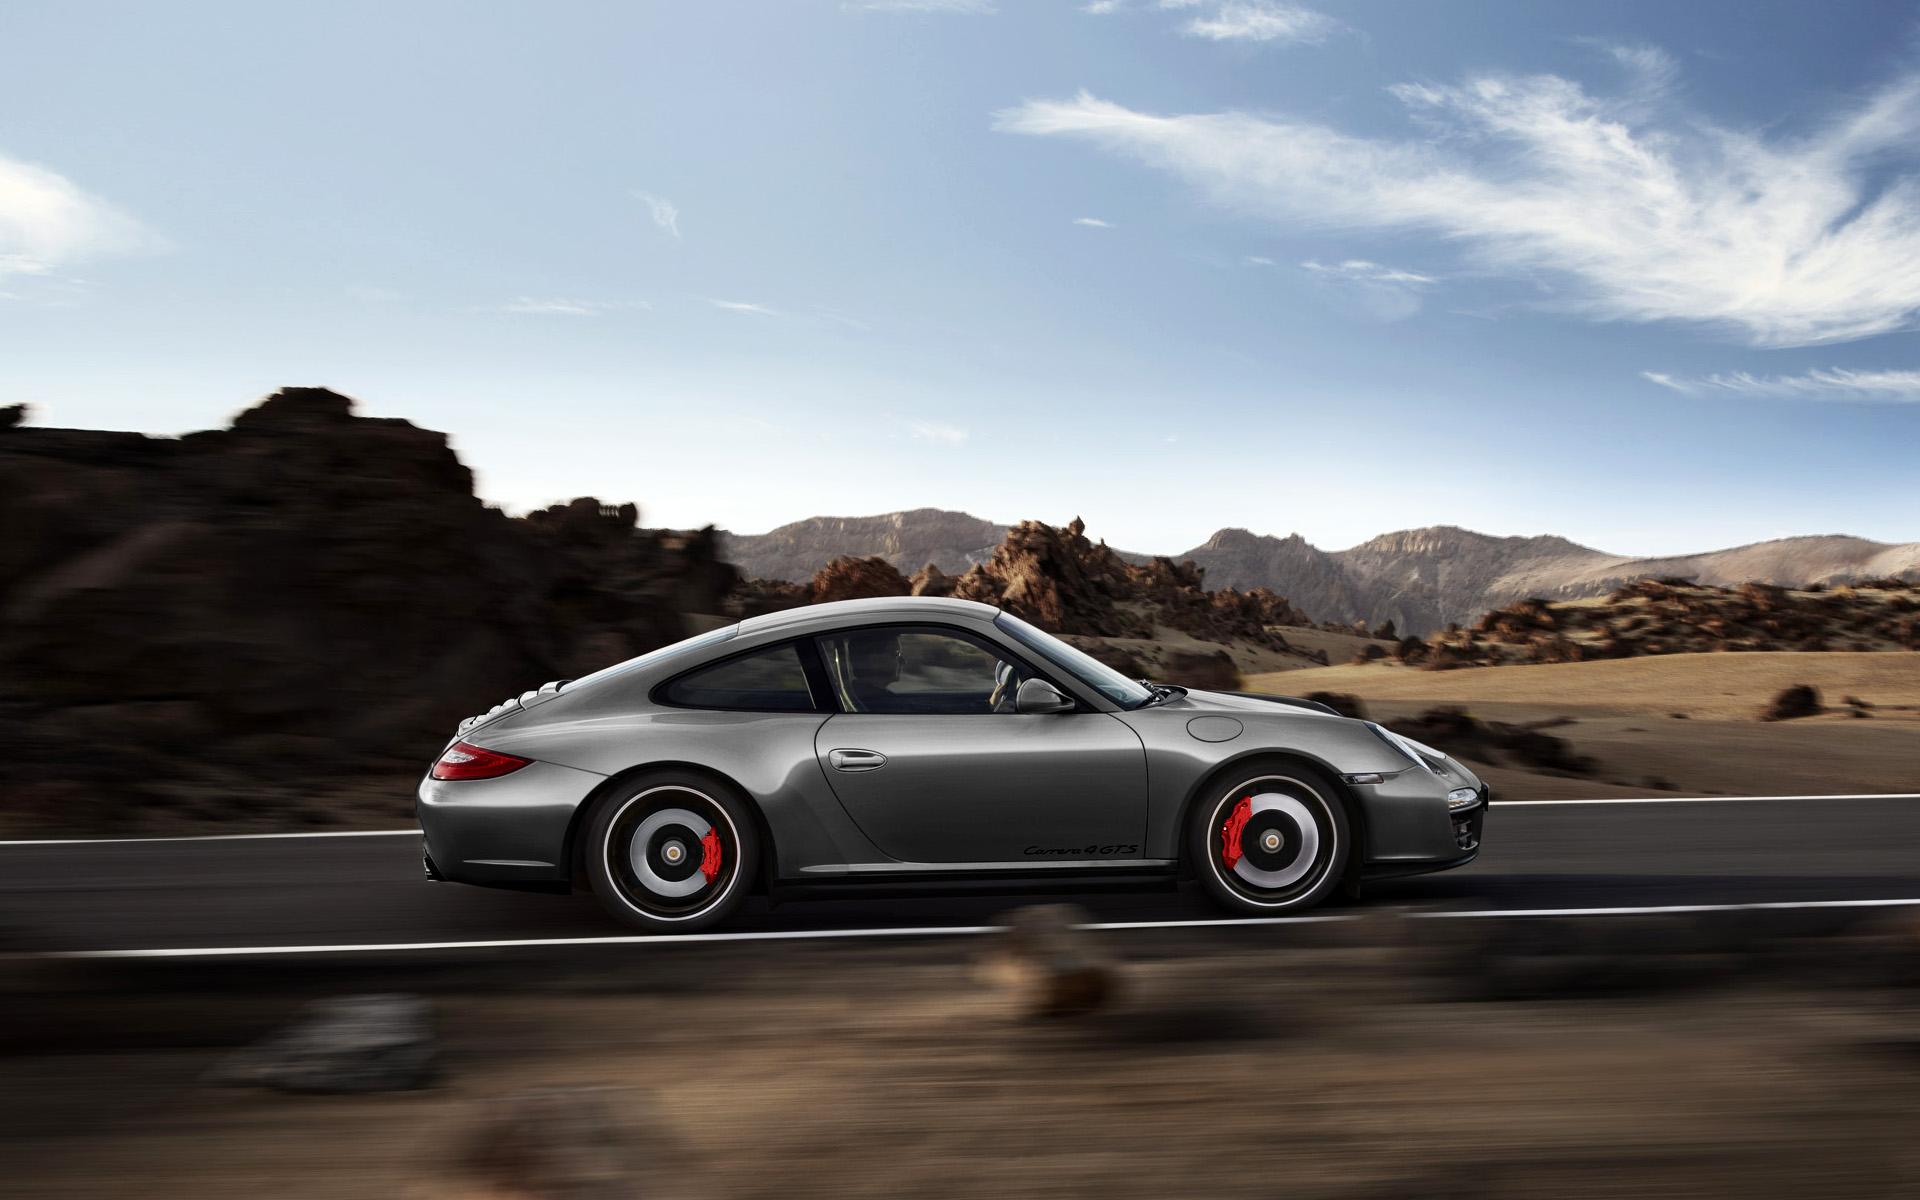 Porsche 911 Carrera 4 GTS Wallpaper